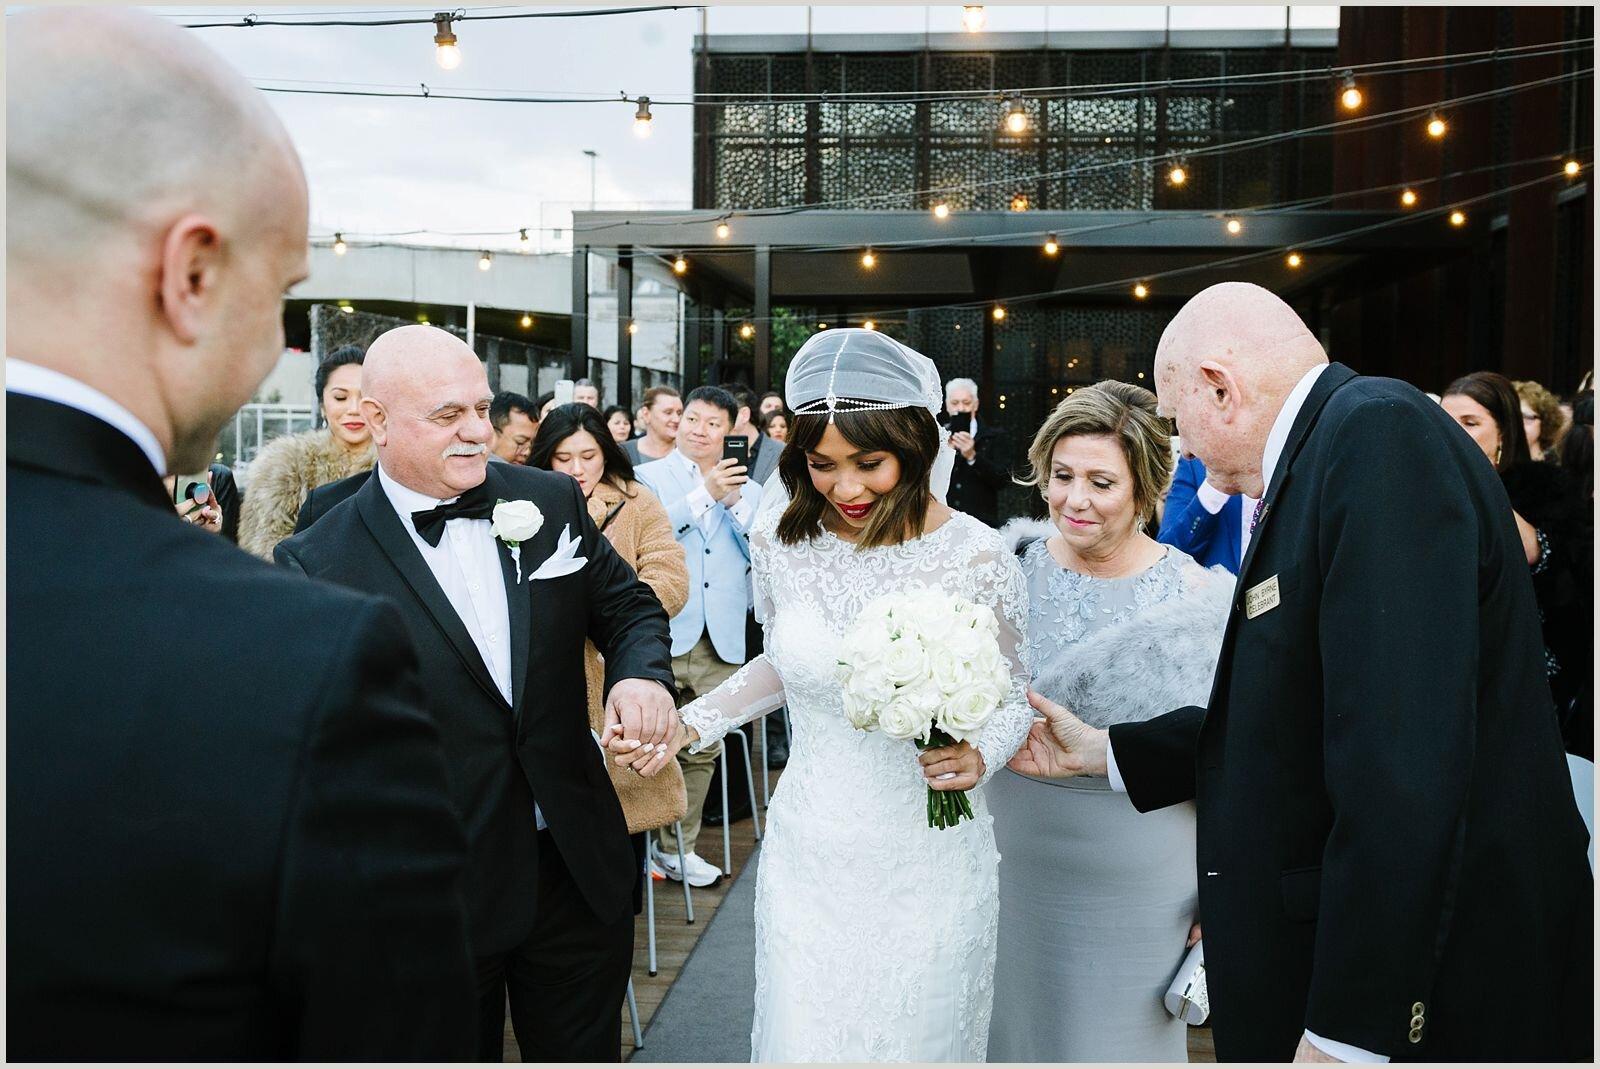 joseph_koprek_wedding_melbourne_the_prince_deck_0051.jpg